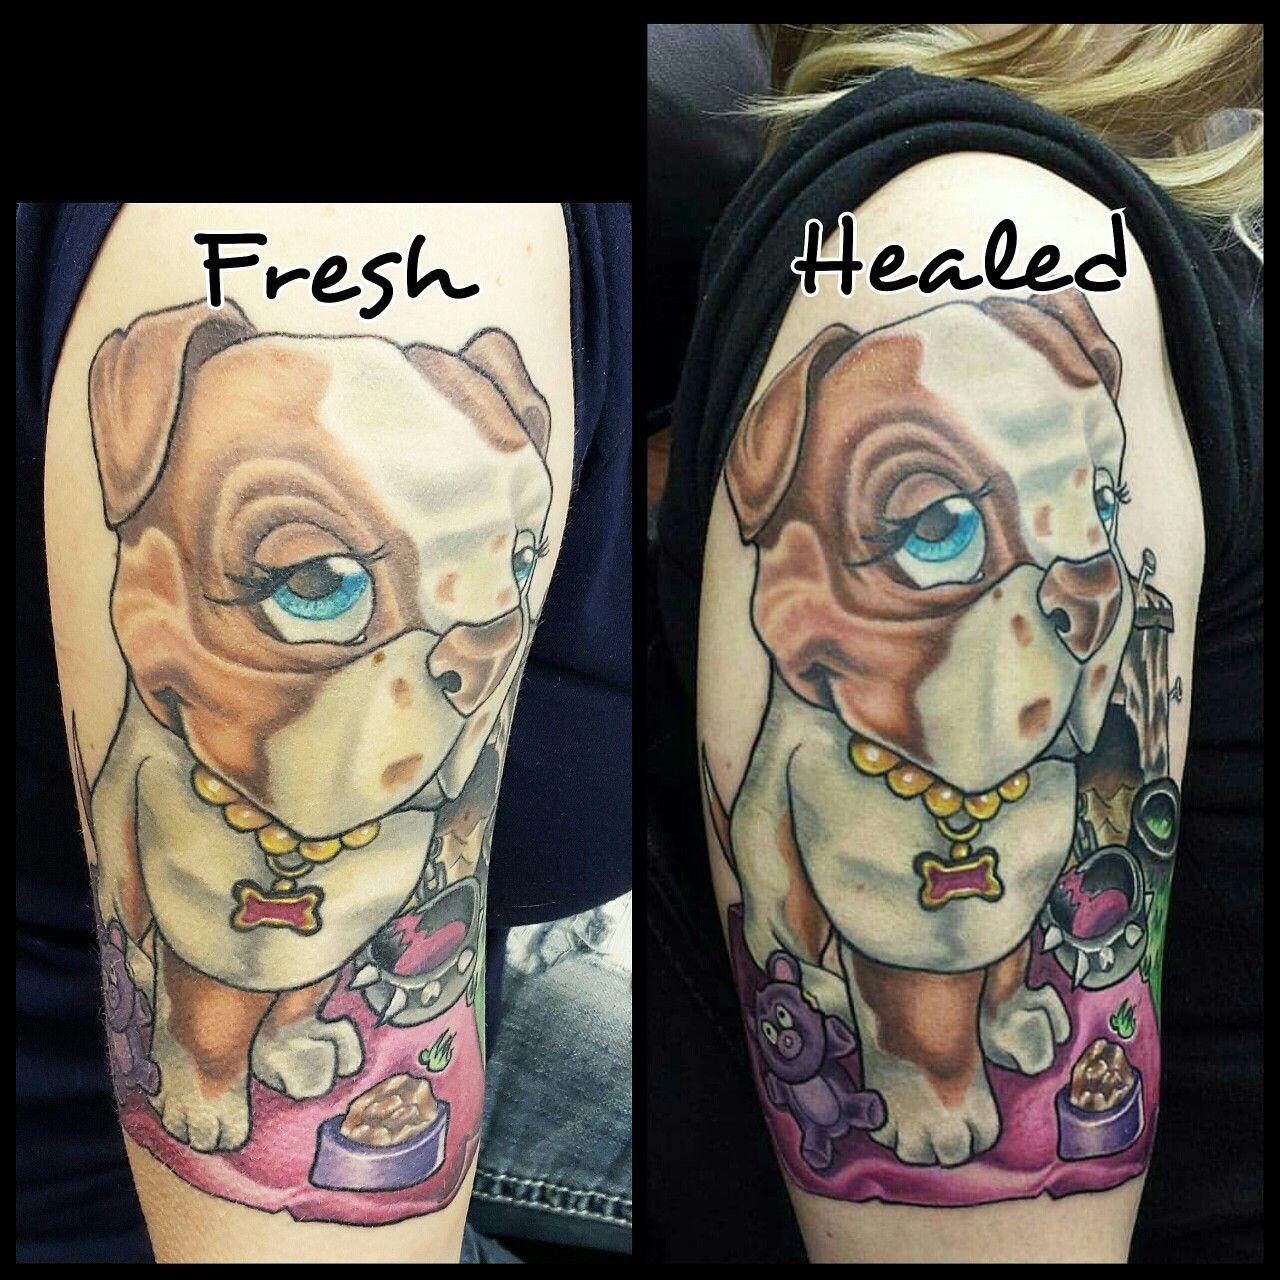 Another cool piece I tattooed   #eternalink #fkirons #jasonflashkuhn #jasonflashkuhntattoo #wichitaks #kansastattoo #midwesttattoo #fullcolortattoo #colortattoo #newschool #newschooltattoo #tattoo #tattoo #tattoos #hellcity #bestofthemidwest #tattoo #tattooed #photorealism #fullcolor #watercolor #watercolortattoo